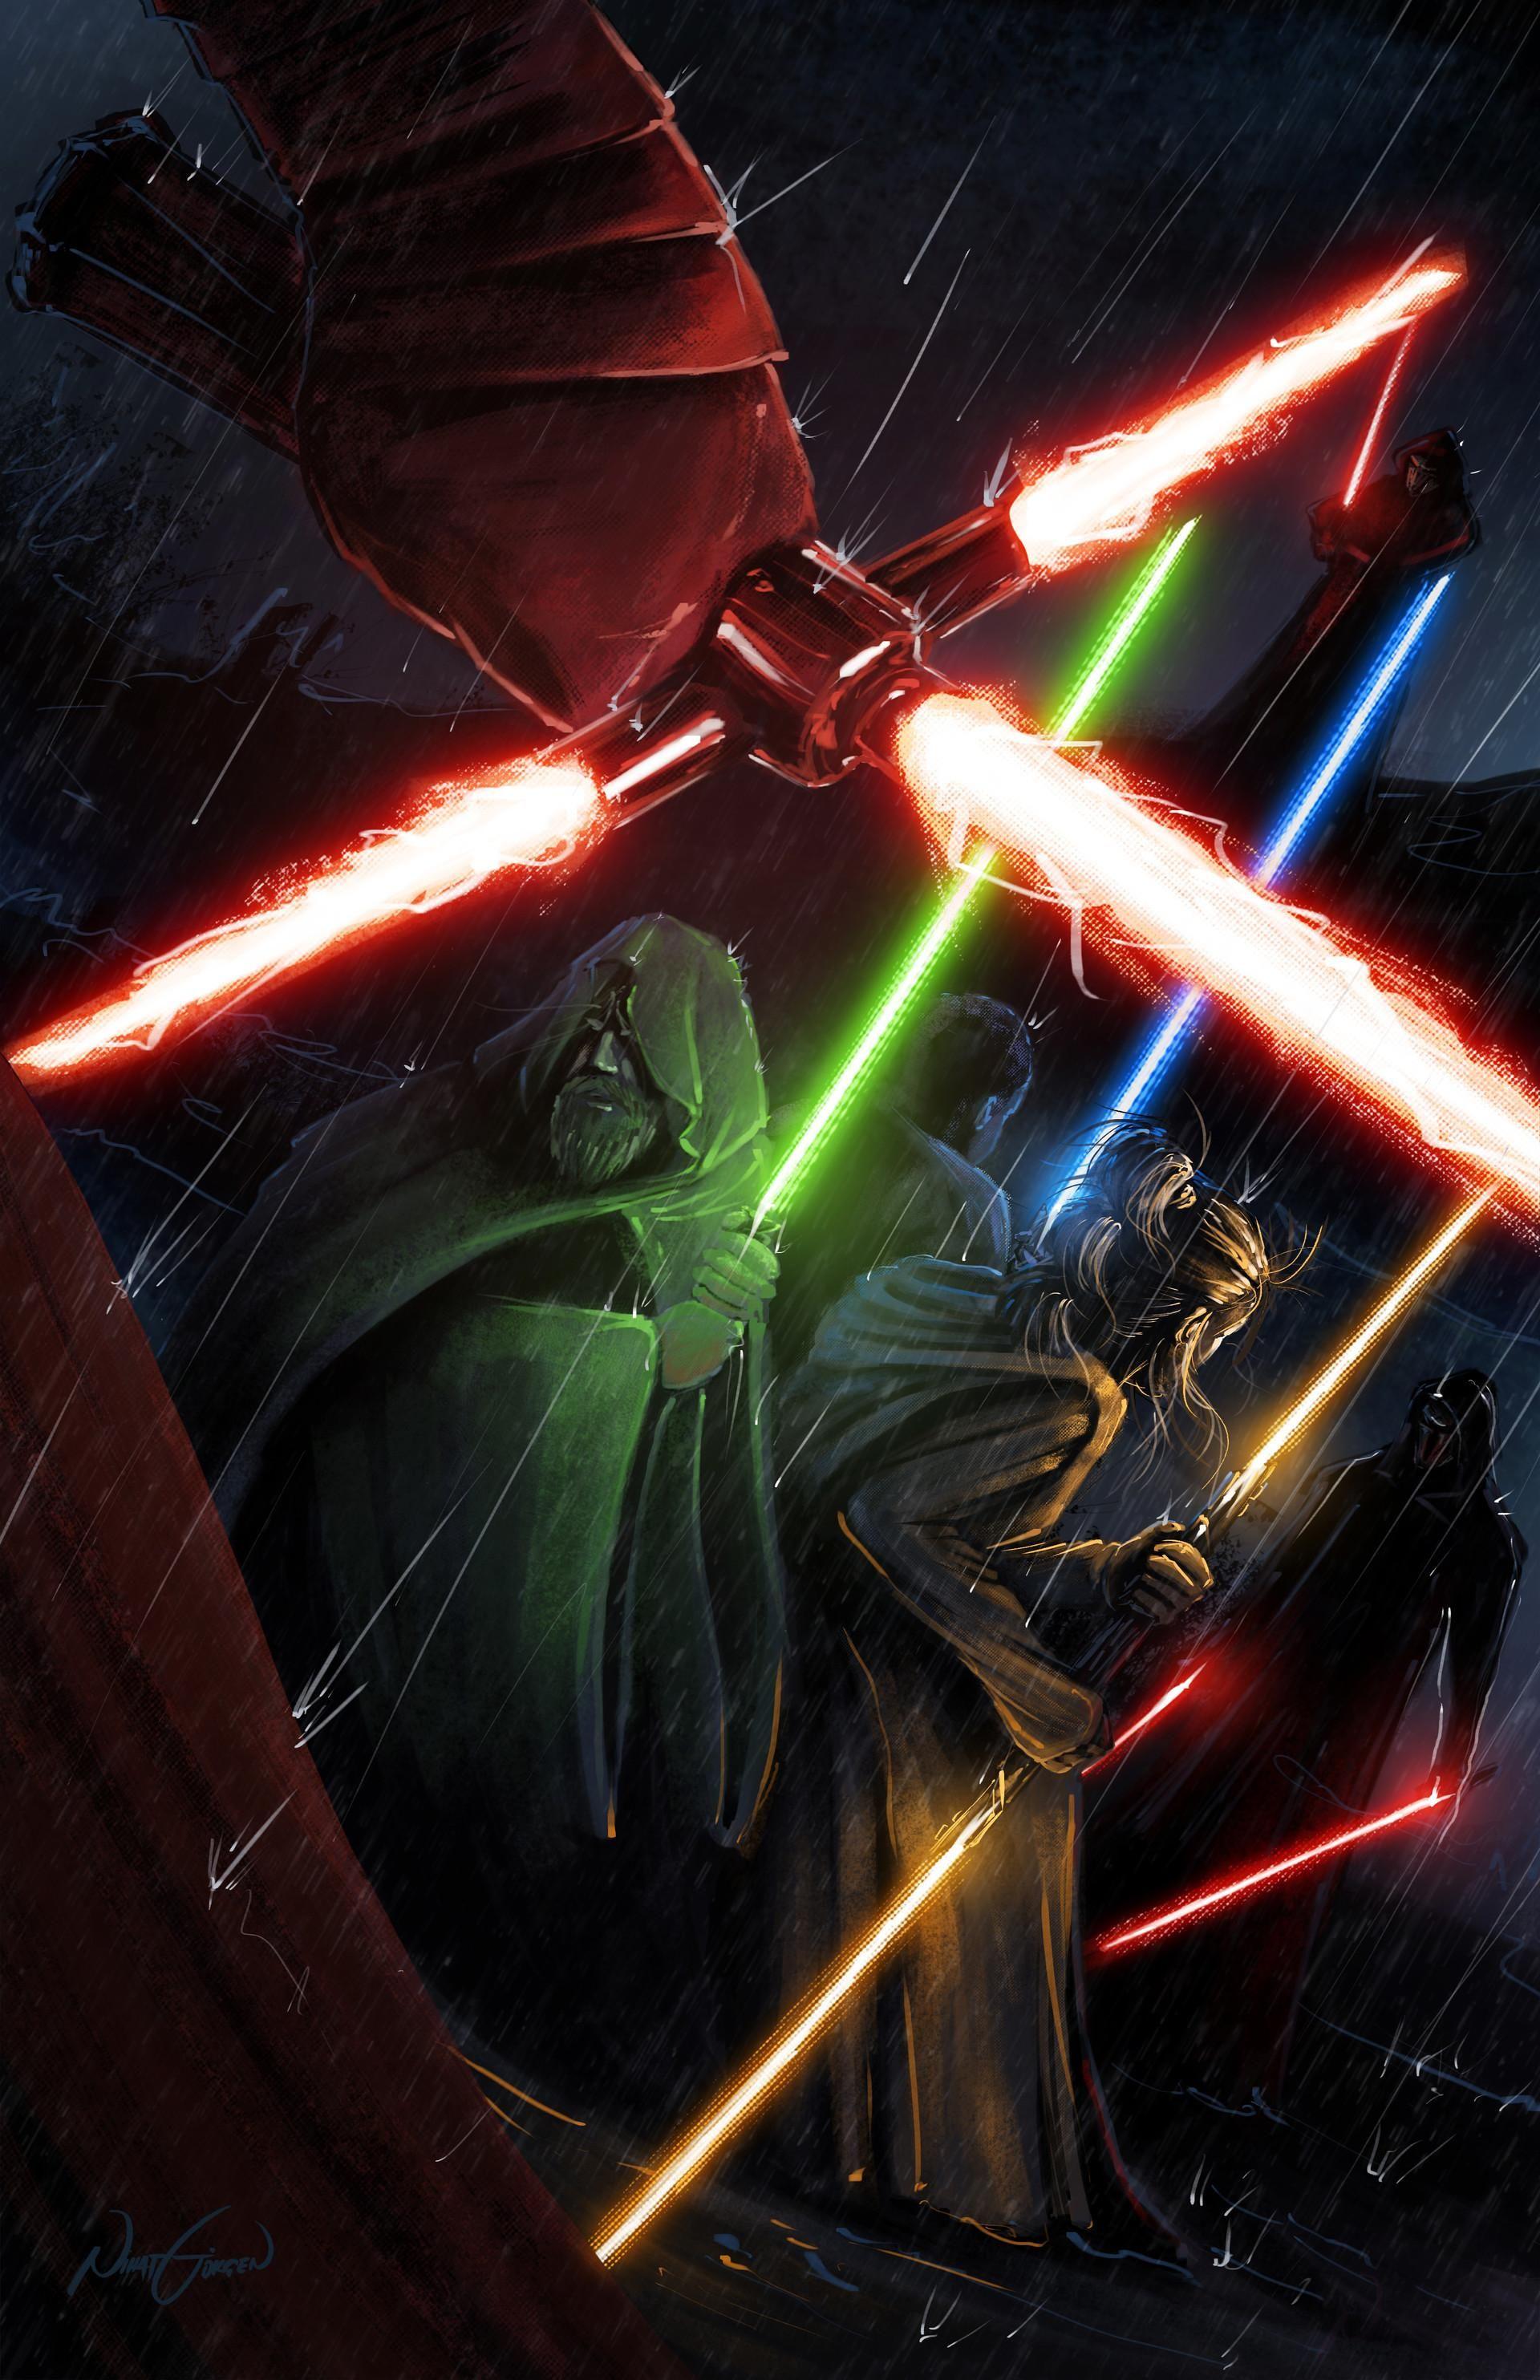 Kylo Ren And His Knights Vs Master Luke Skywalker And His Padawan